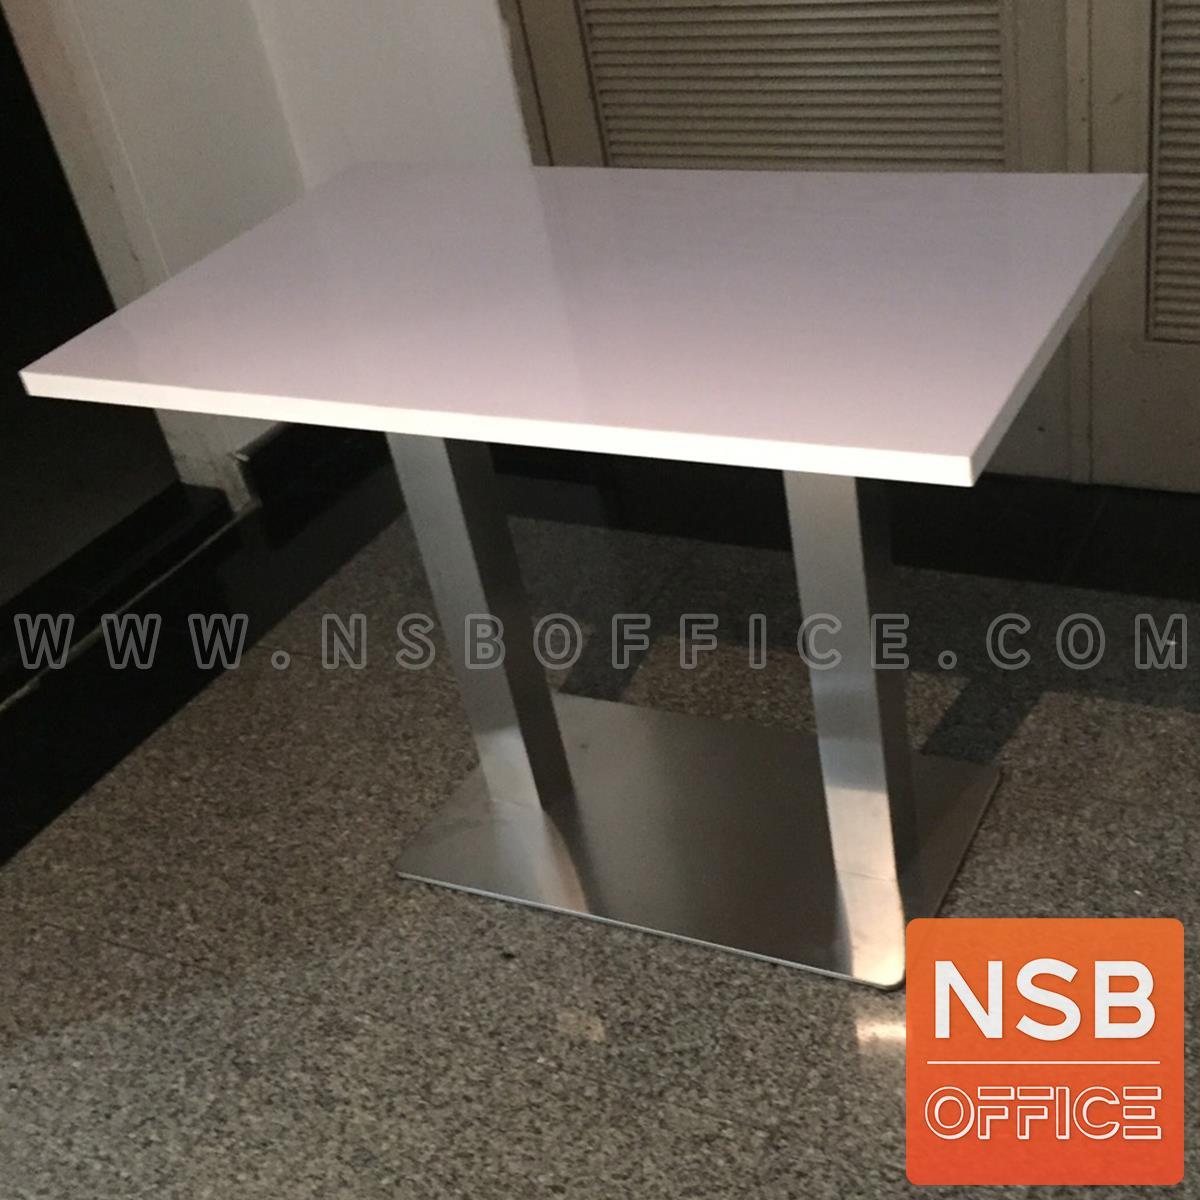 A14A281:โต๊ะบาร์ COFFEE รุ่น Stardew (สตาร์ดิว)  หน้าท็อปเมลามีน ขาสเตนเลสแผ่นเหลี่ยม